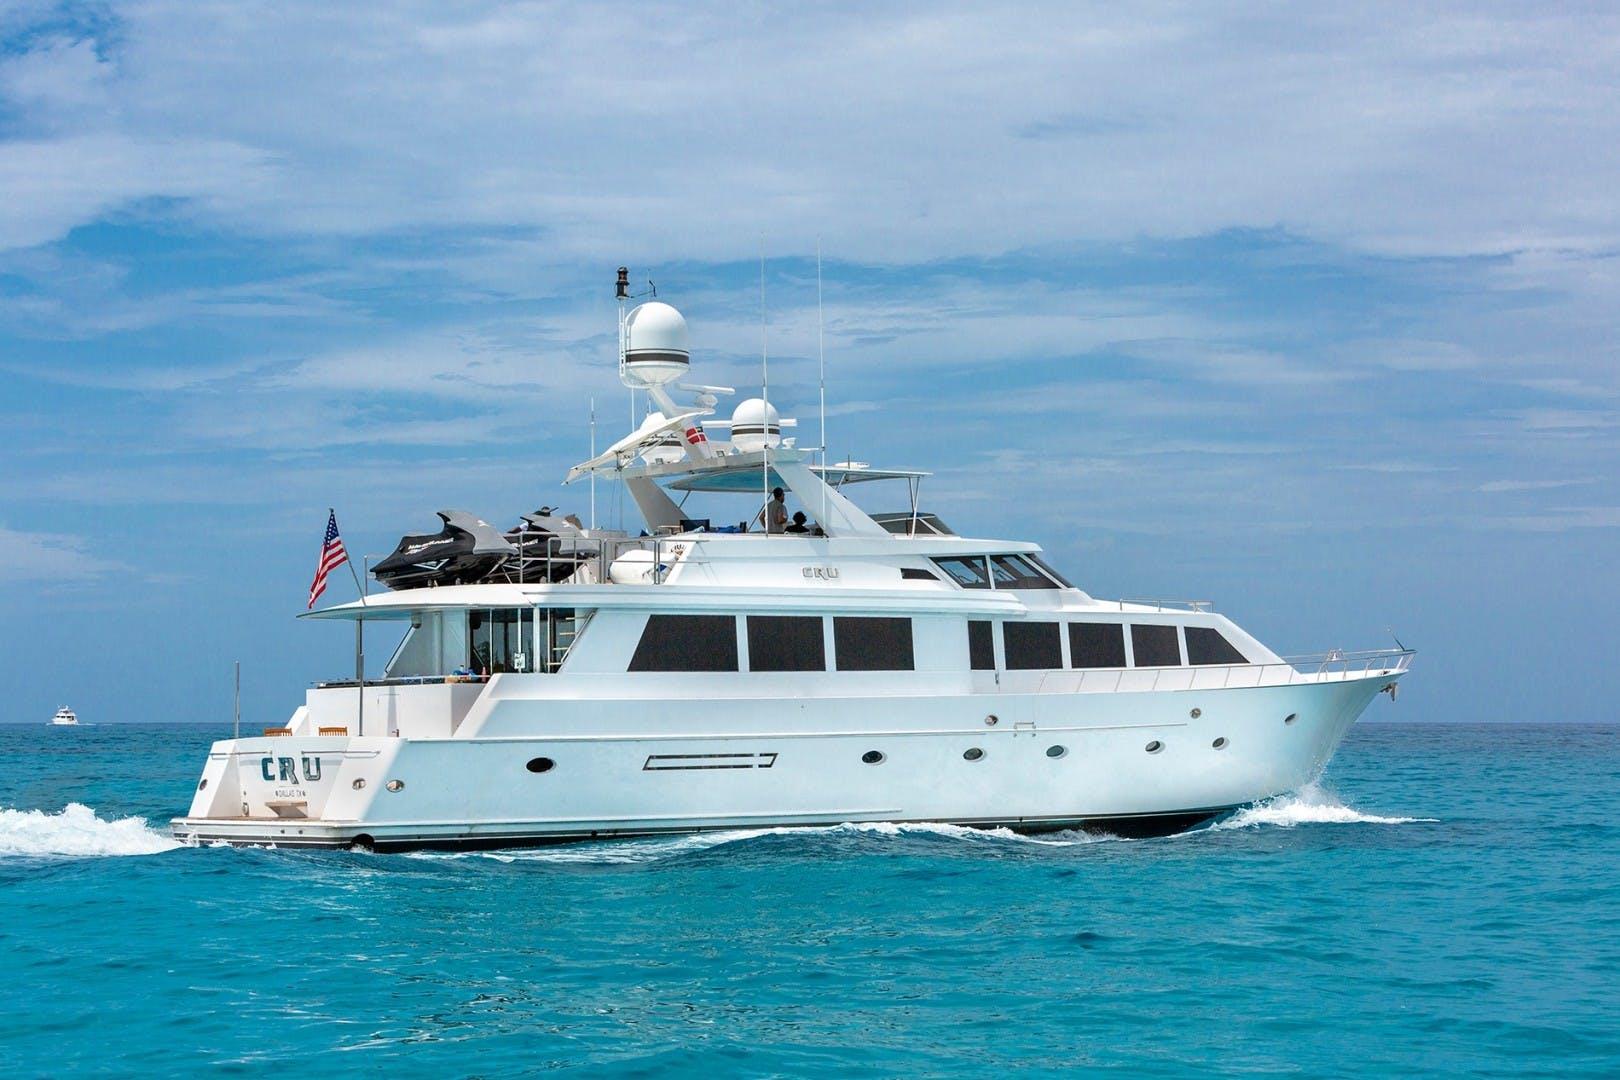 1991 Westship 96' Motor Yacht Cru | Picture 4 of 33